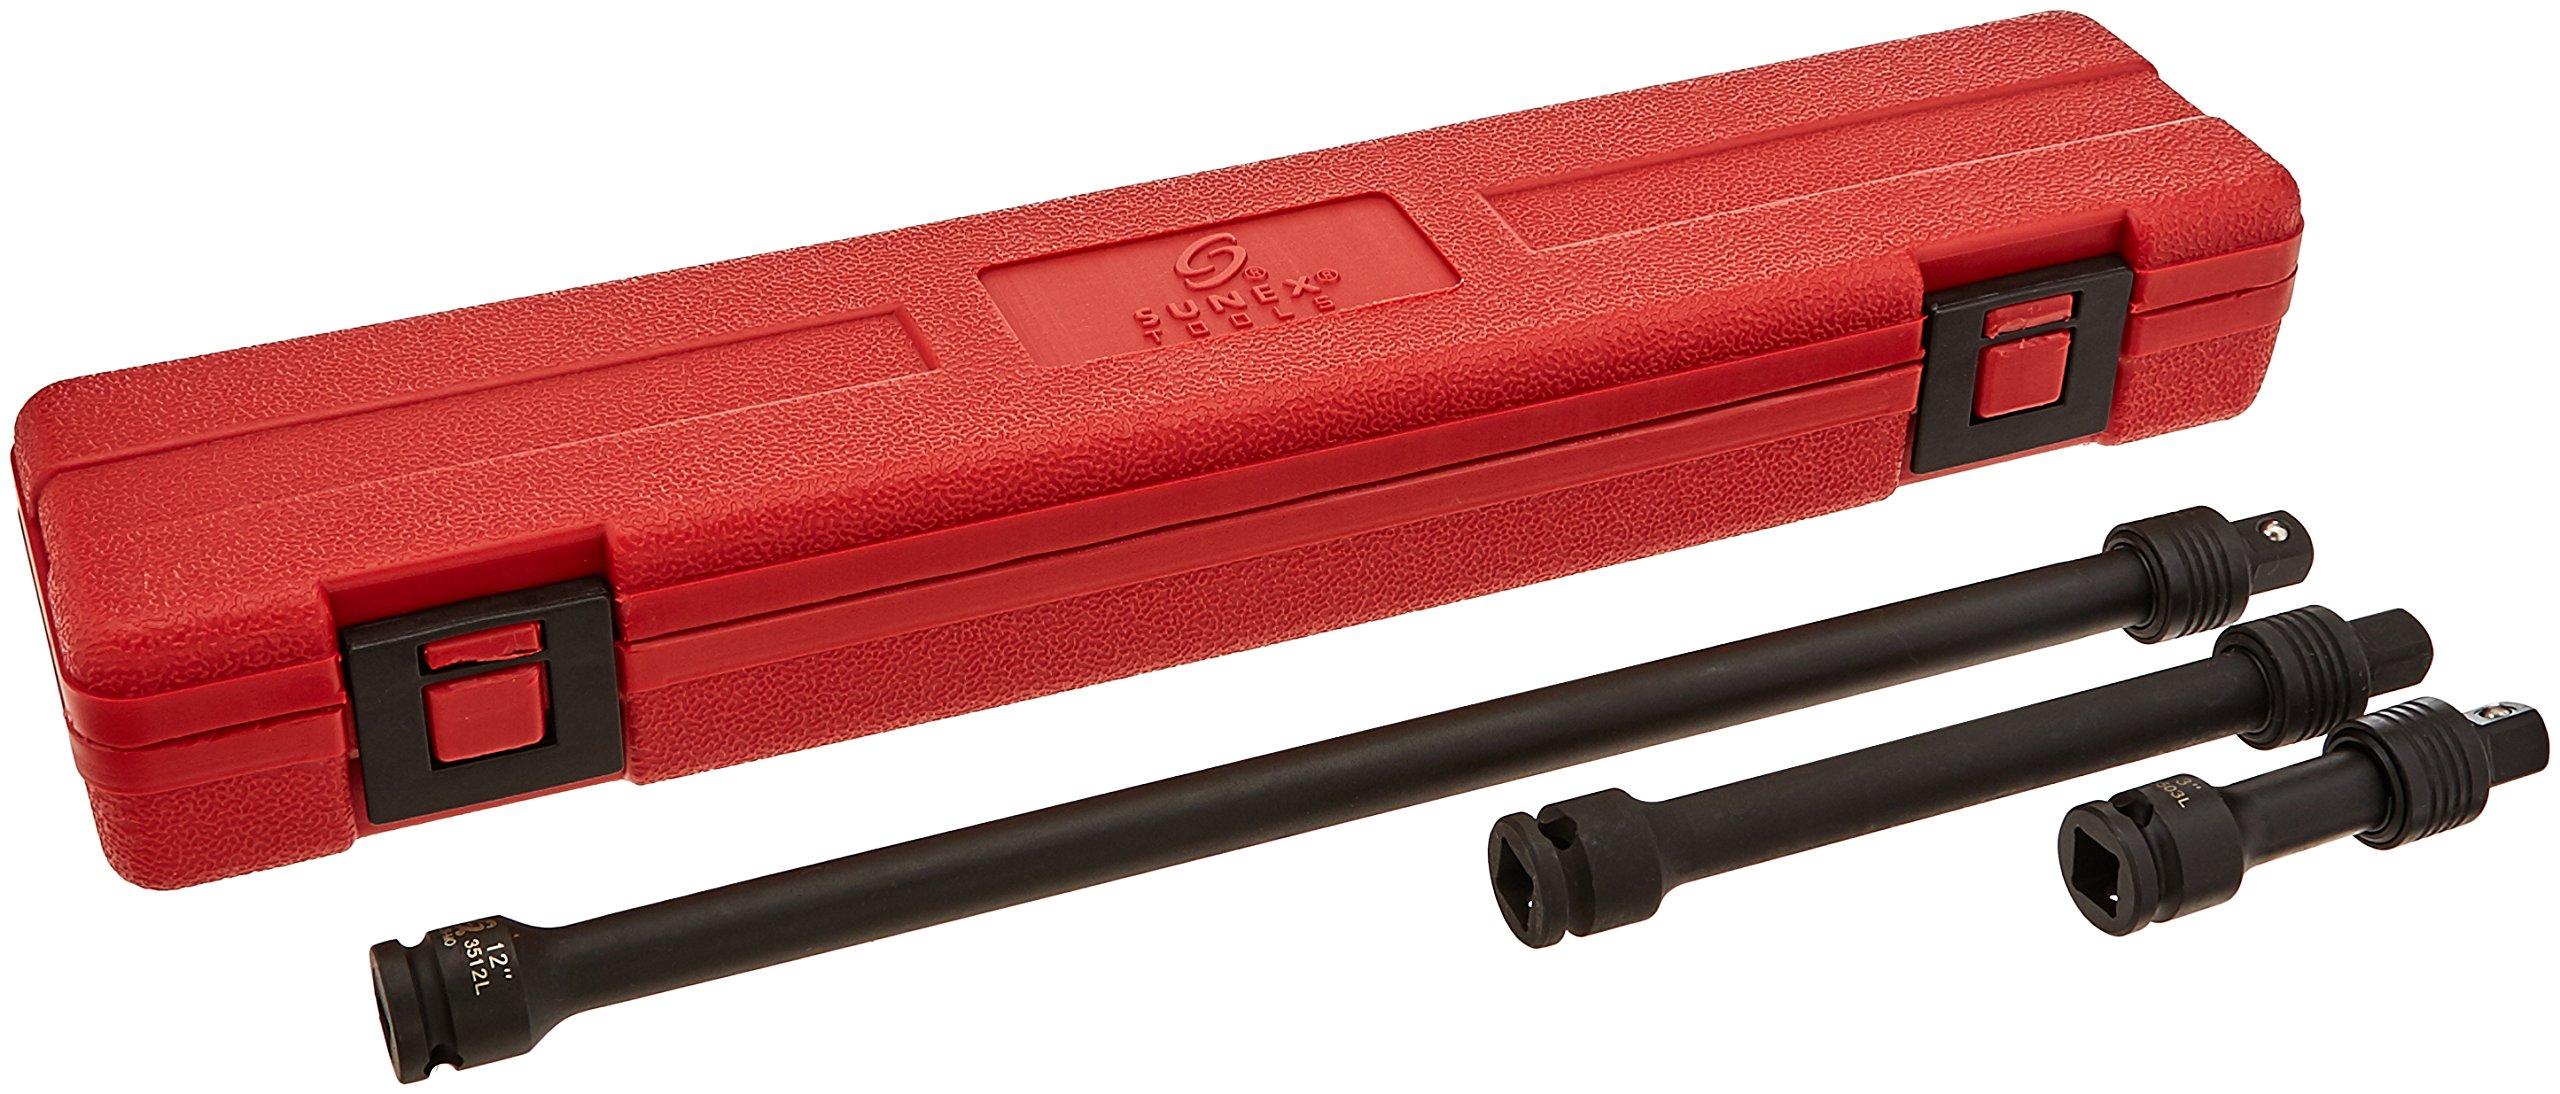 Sunex 3501 3/8-Inch Drive Locking Impact Extension Set, 3-Piece